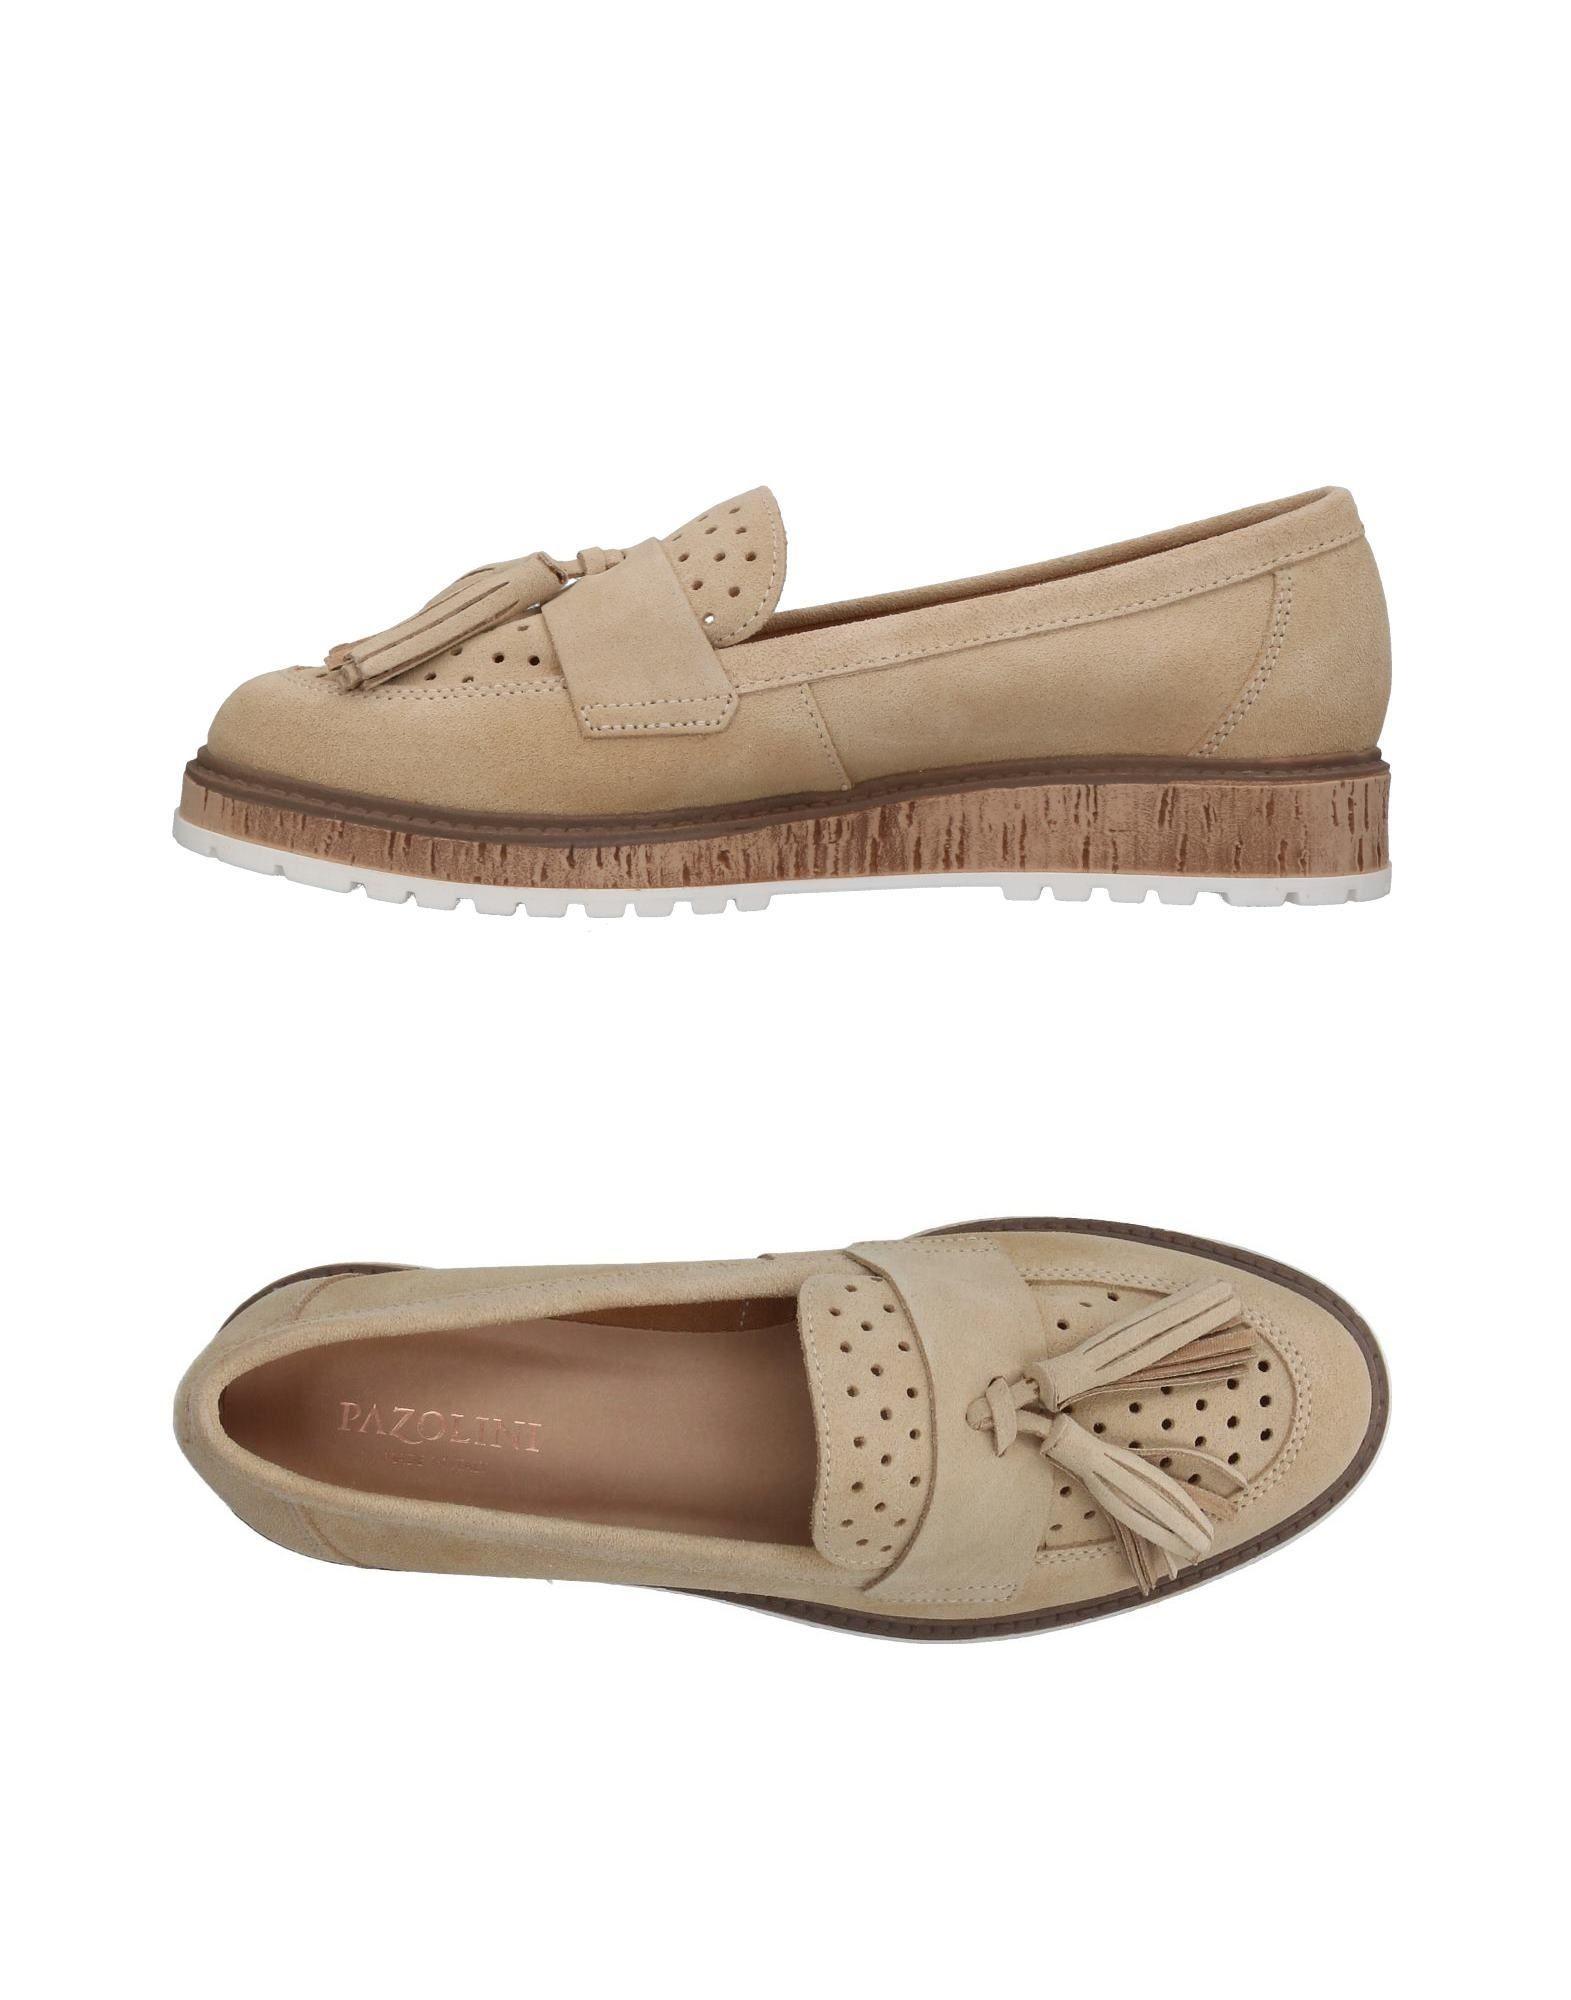 Carlo Pazolini Mokassins Damen  11407523WI Gute Qualität beliebte Schuhe